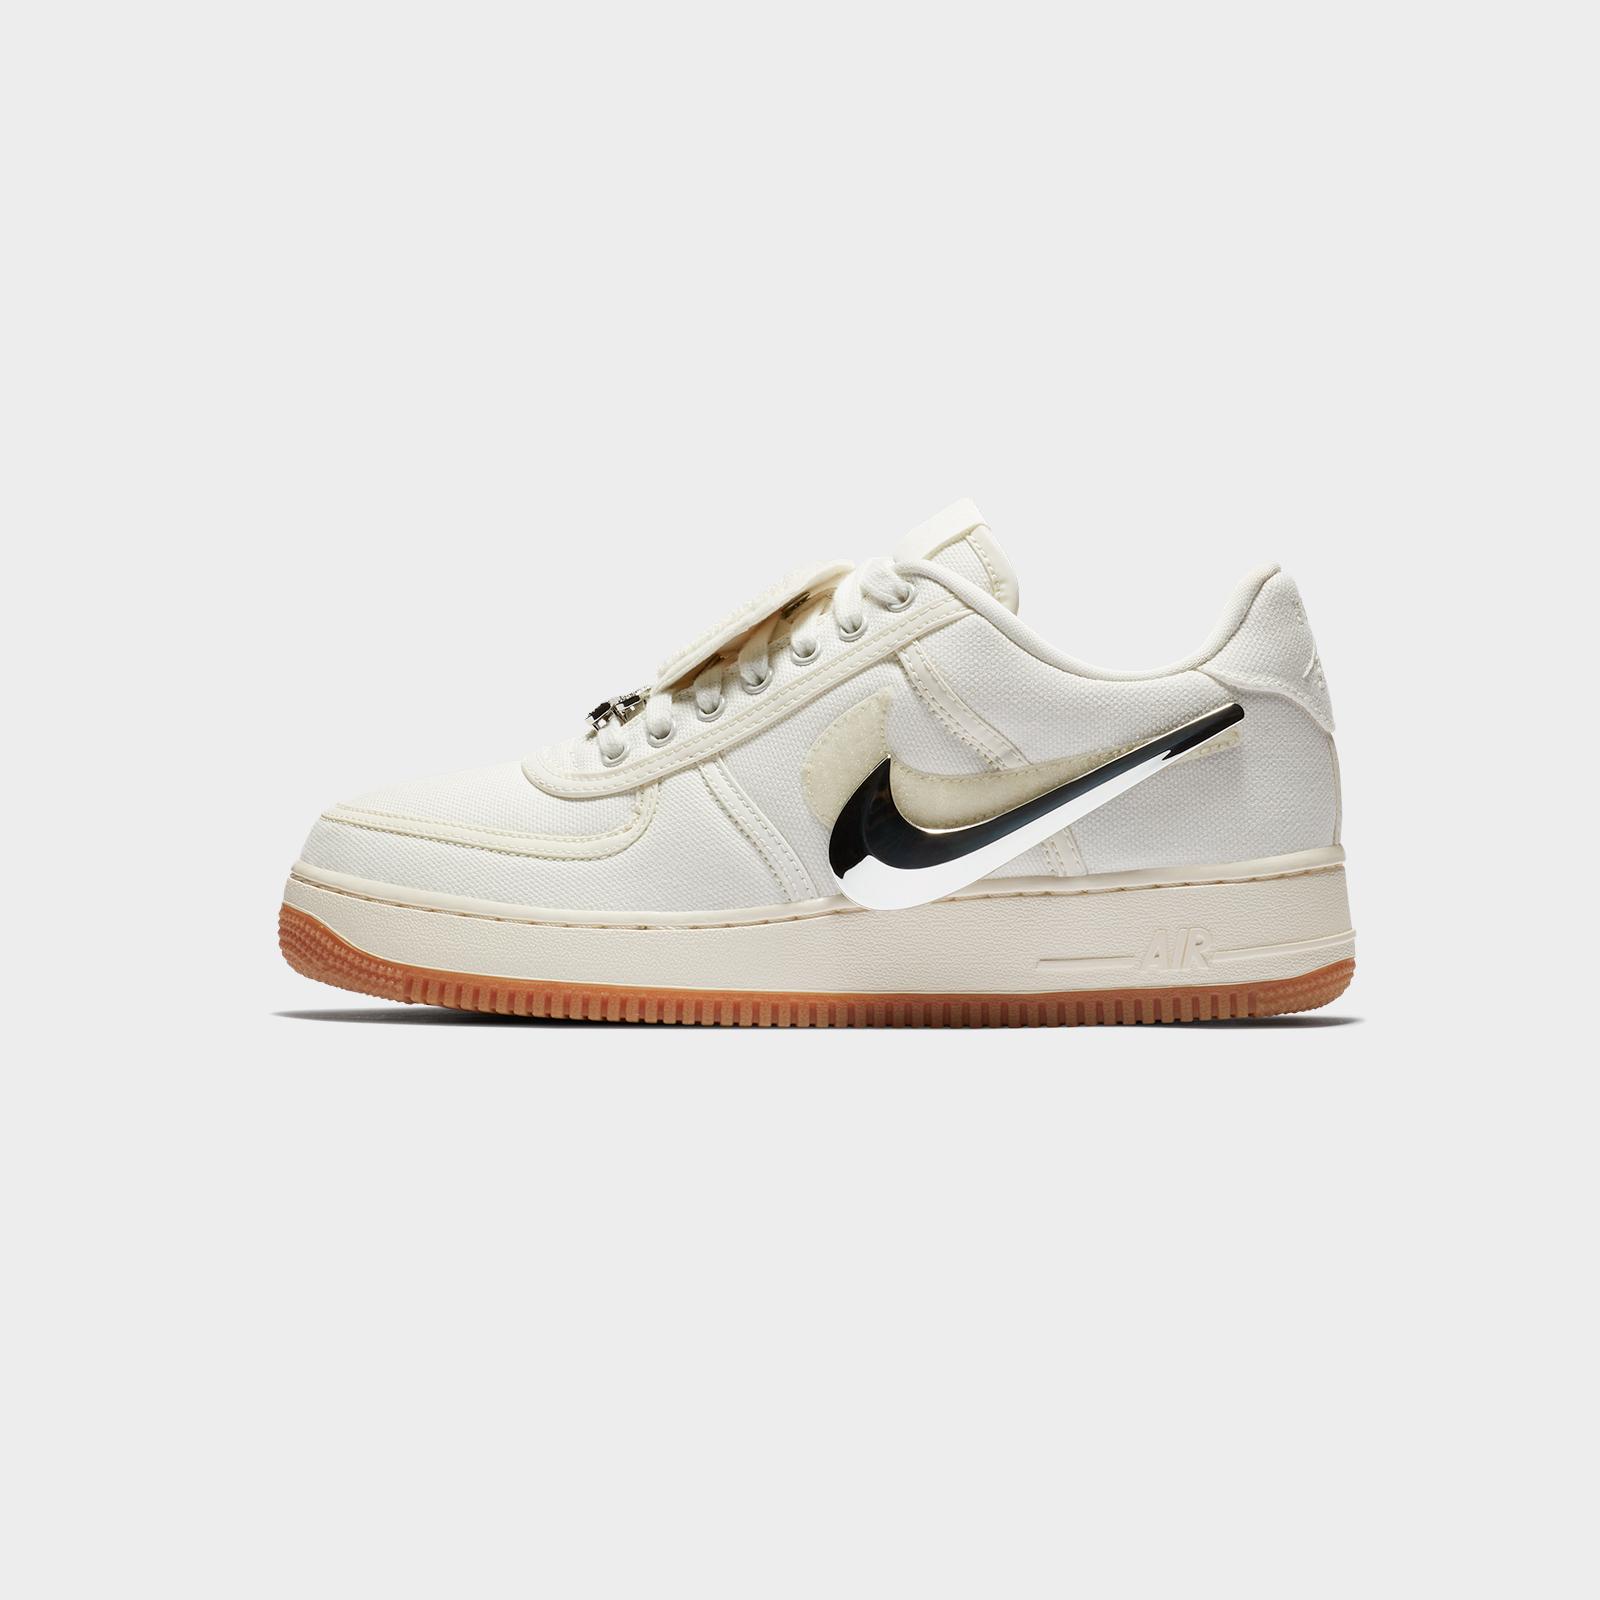 Nike Air Force 1 Low Travis Scott